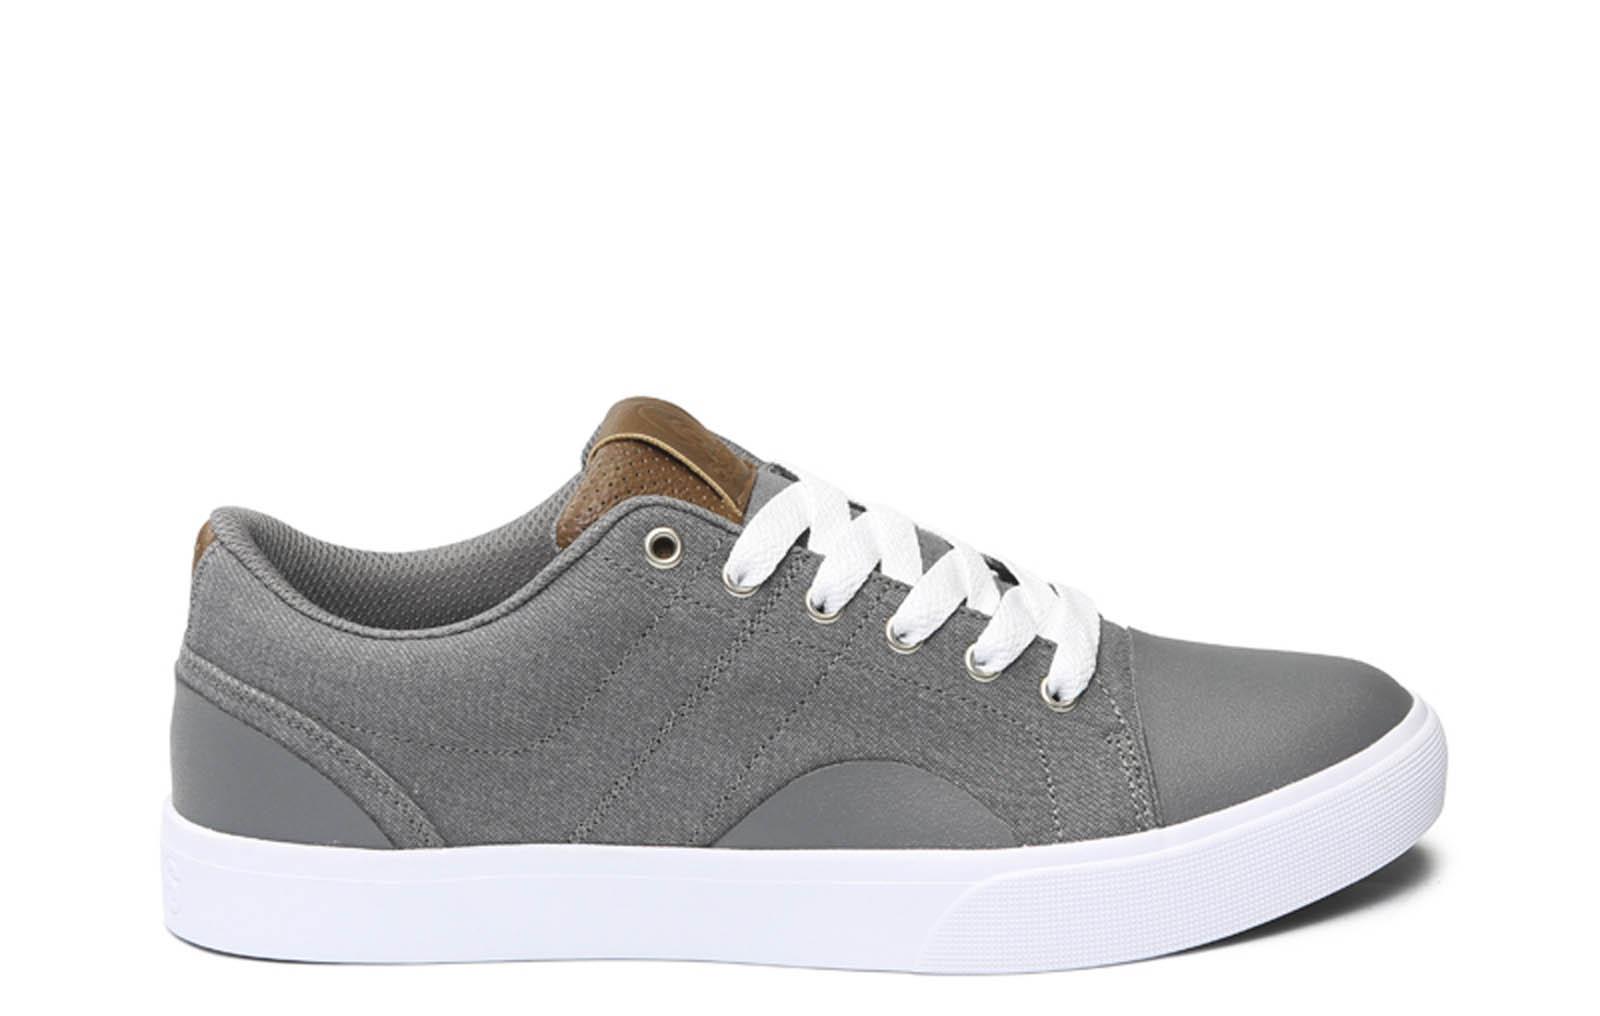 0a93794fe77 Osiris skate footwear preview boardsport source jpg 1600x1016 Spr audi shoes